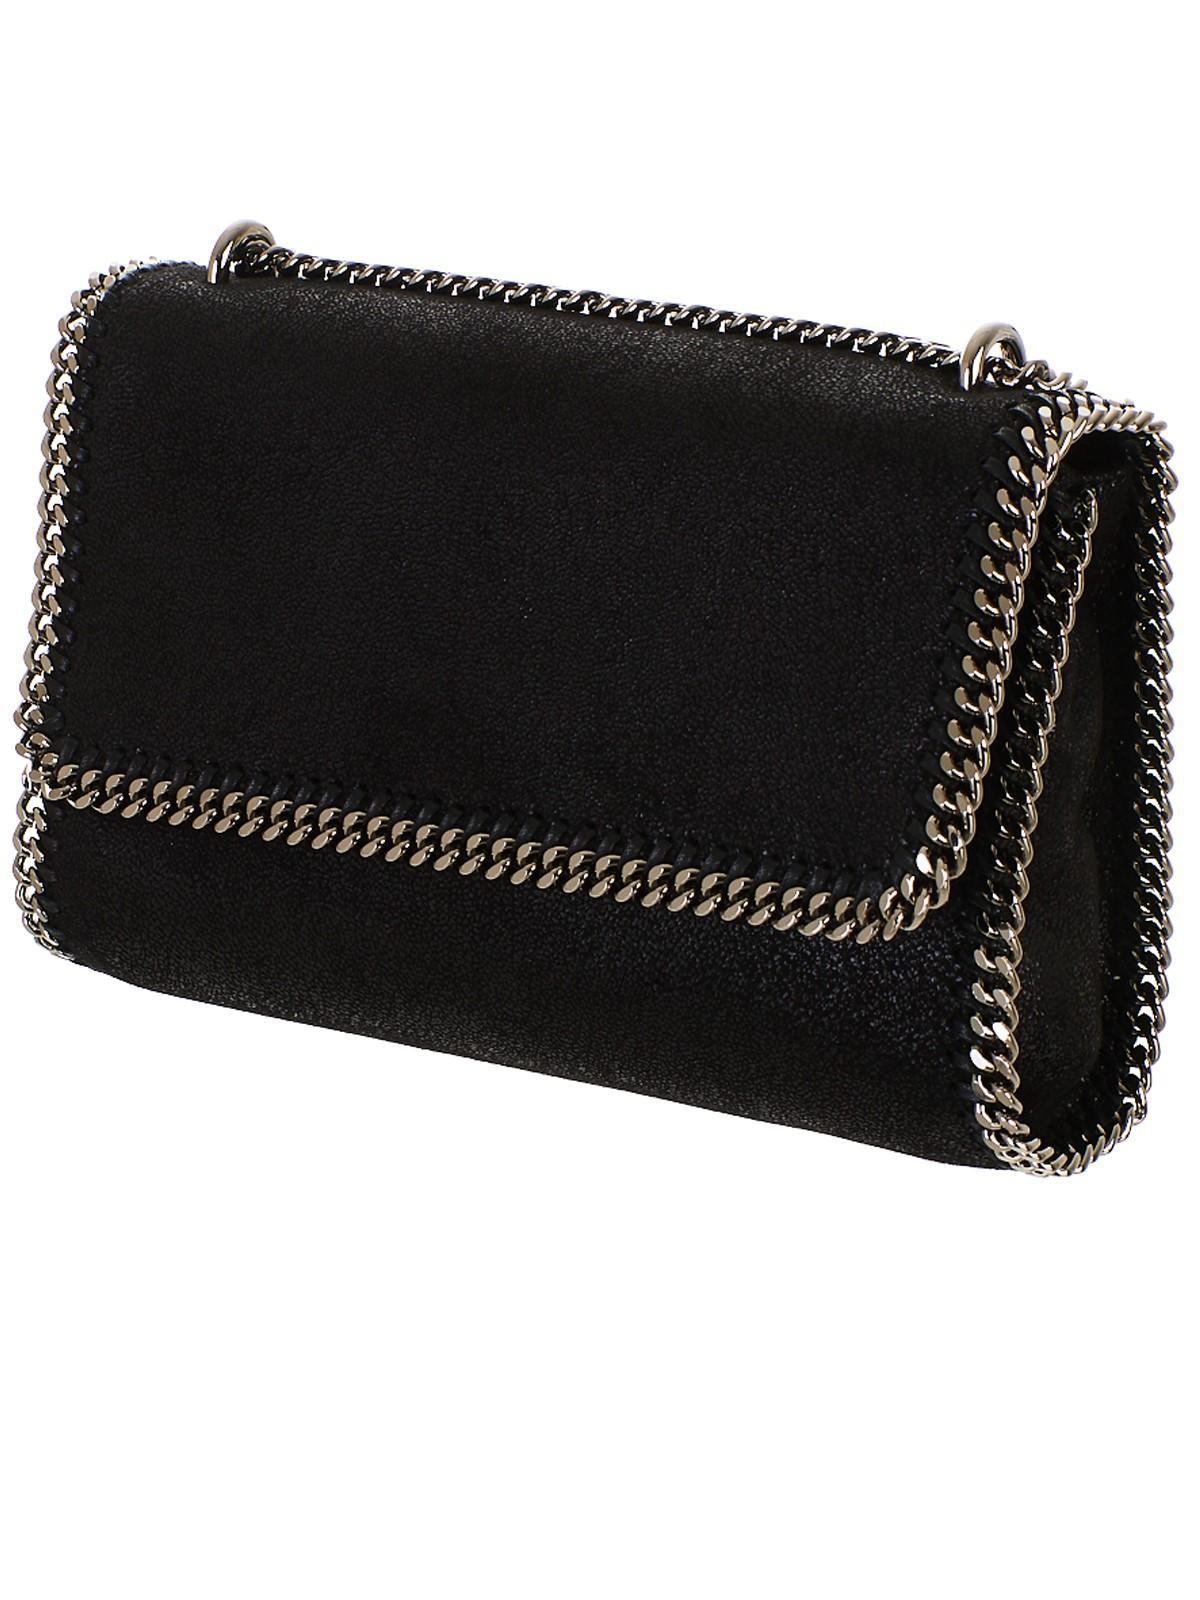 d0dc391d27 Lyst - Stella McCartney Black Falabella Bag in Black